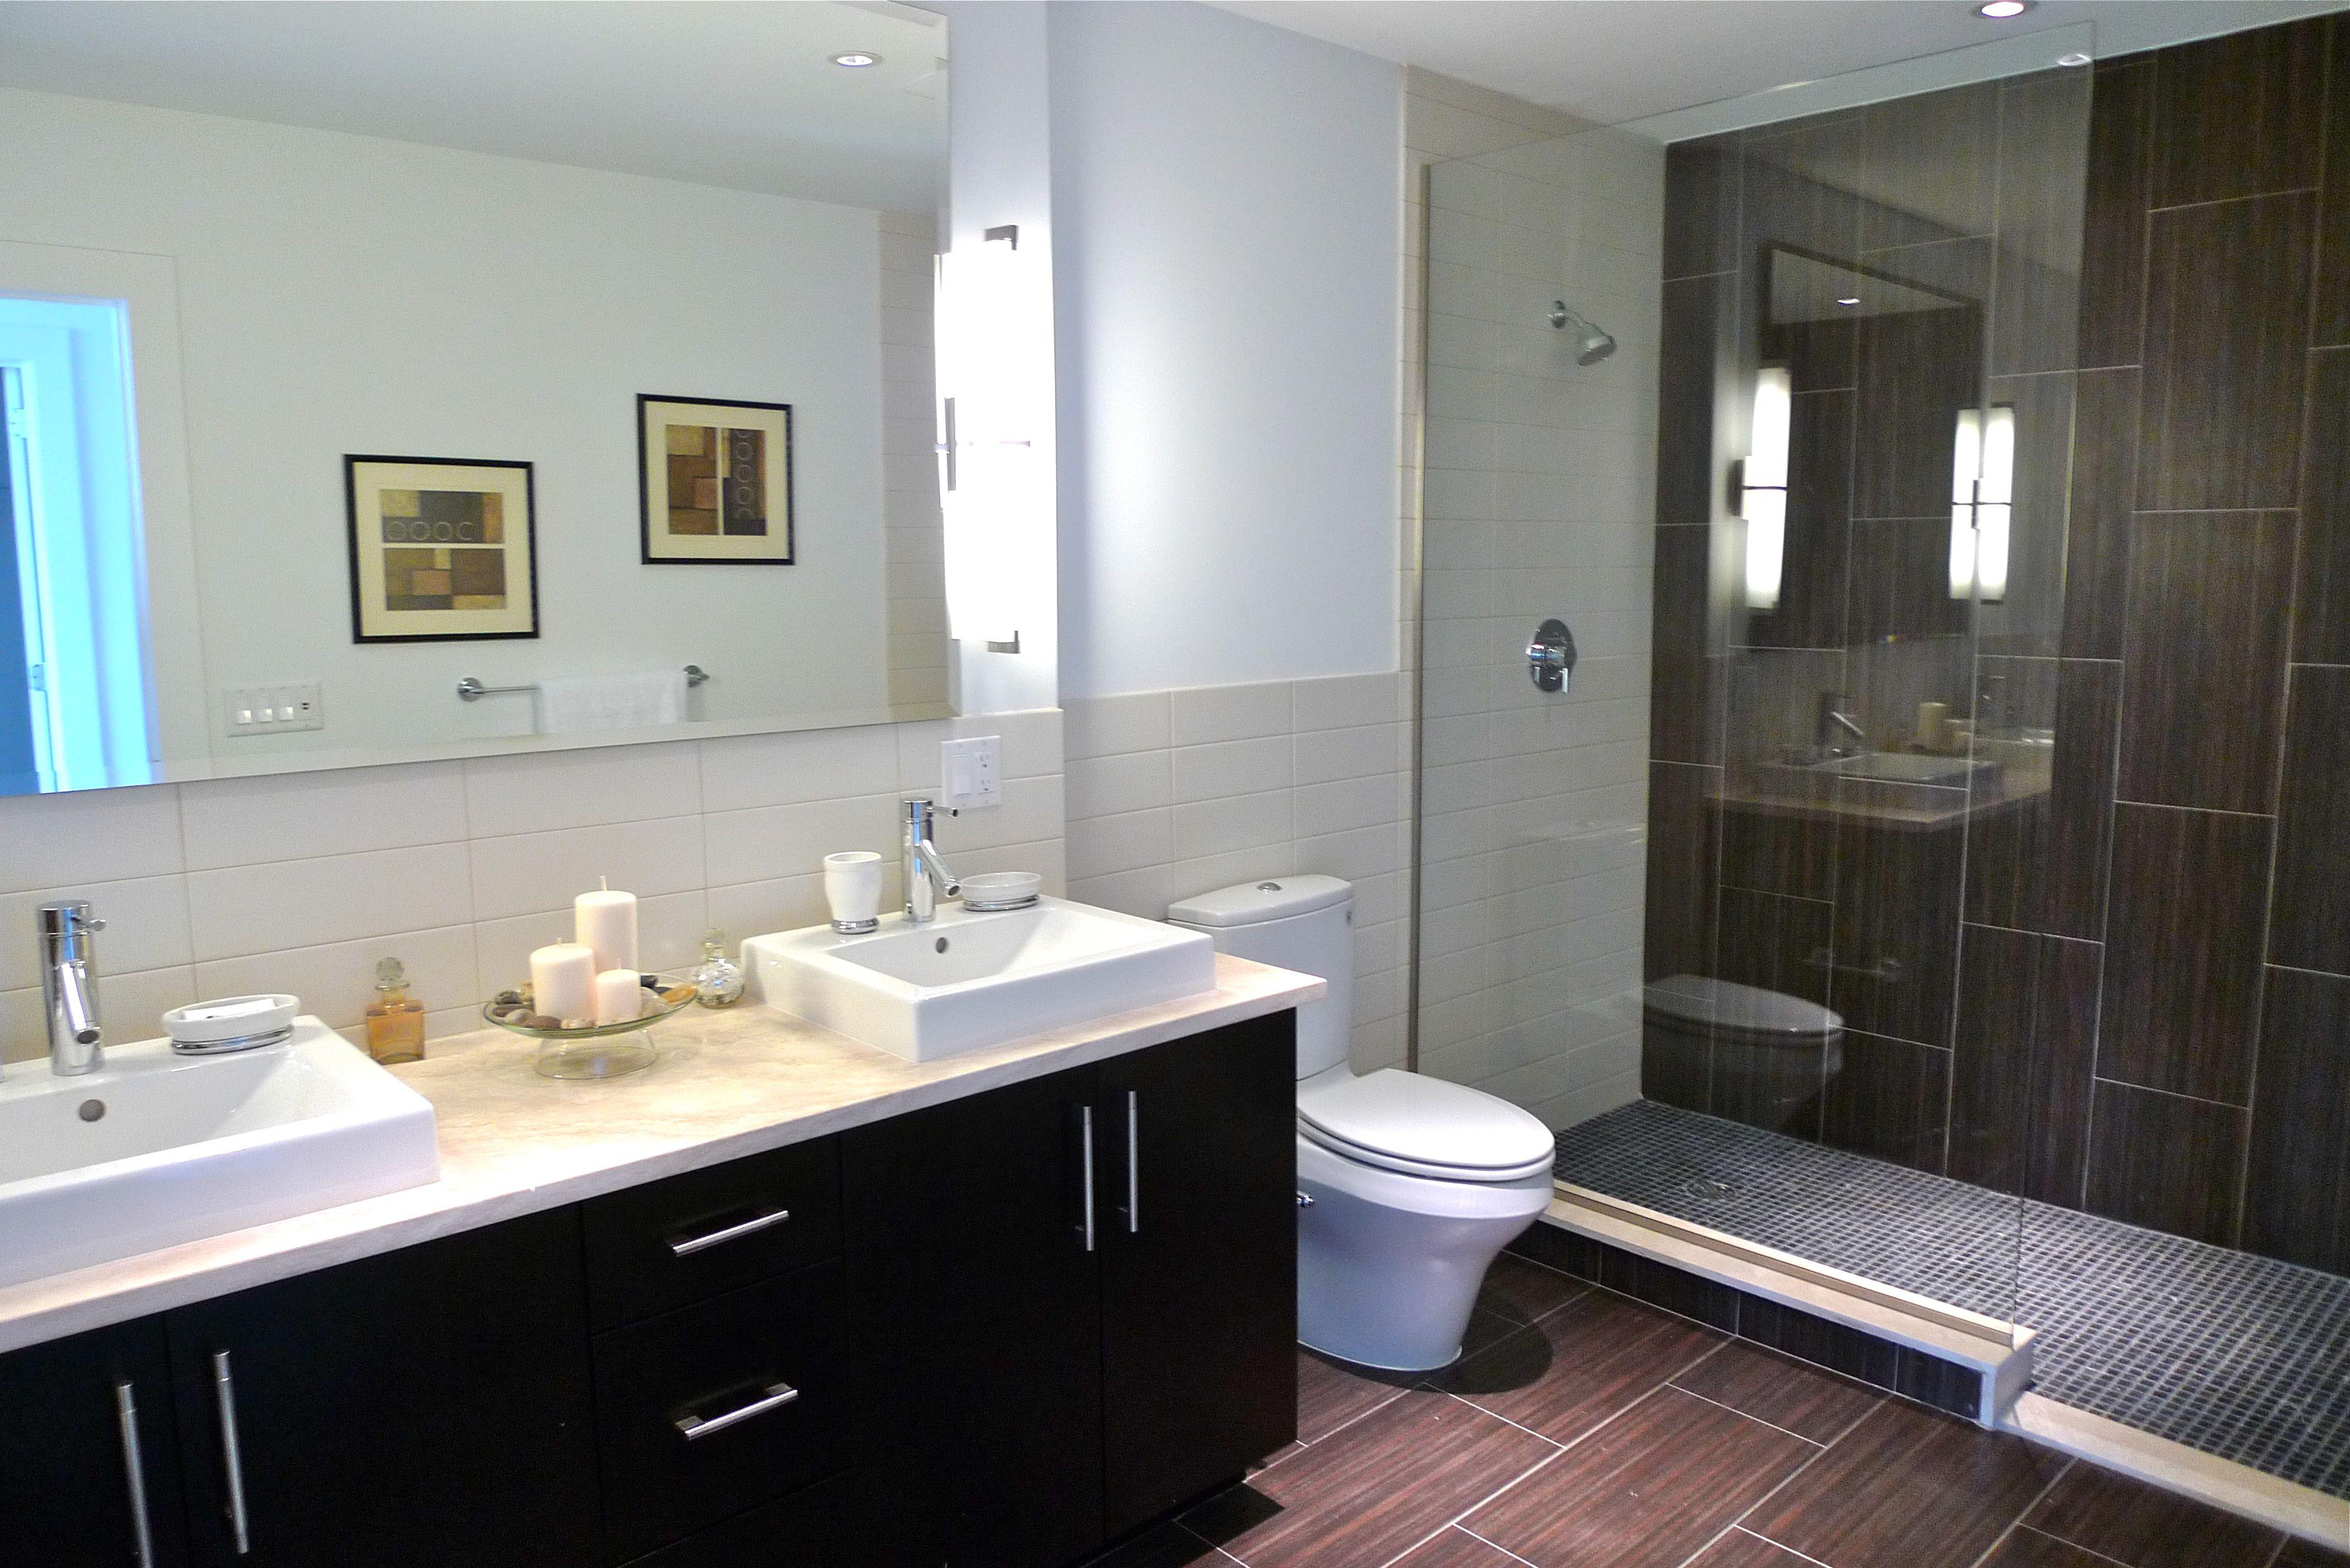 spa bathroom photos photo - 2